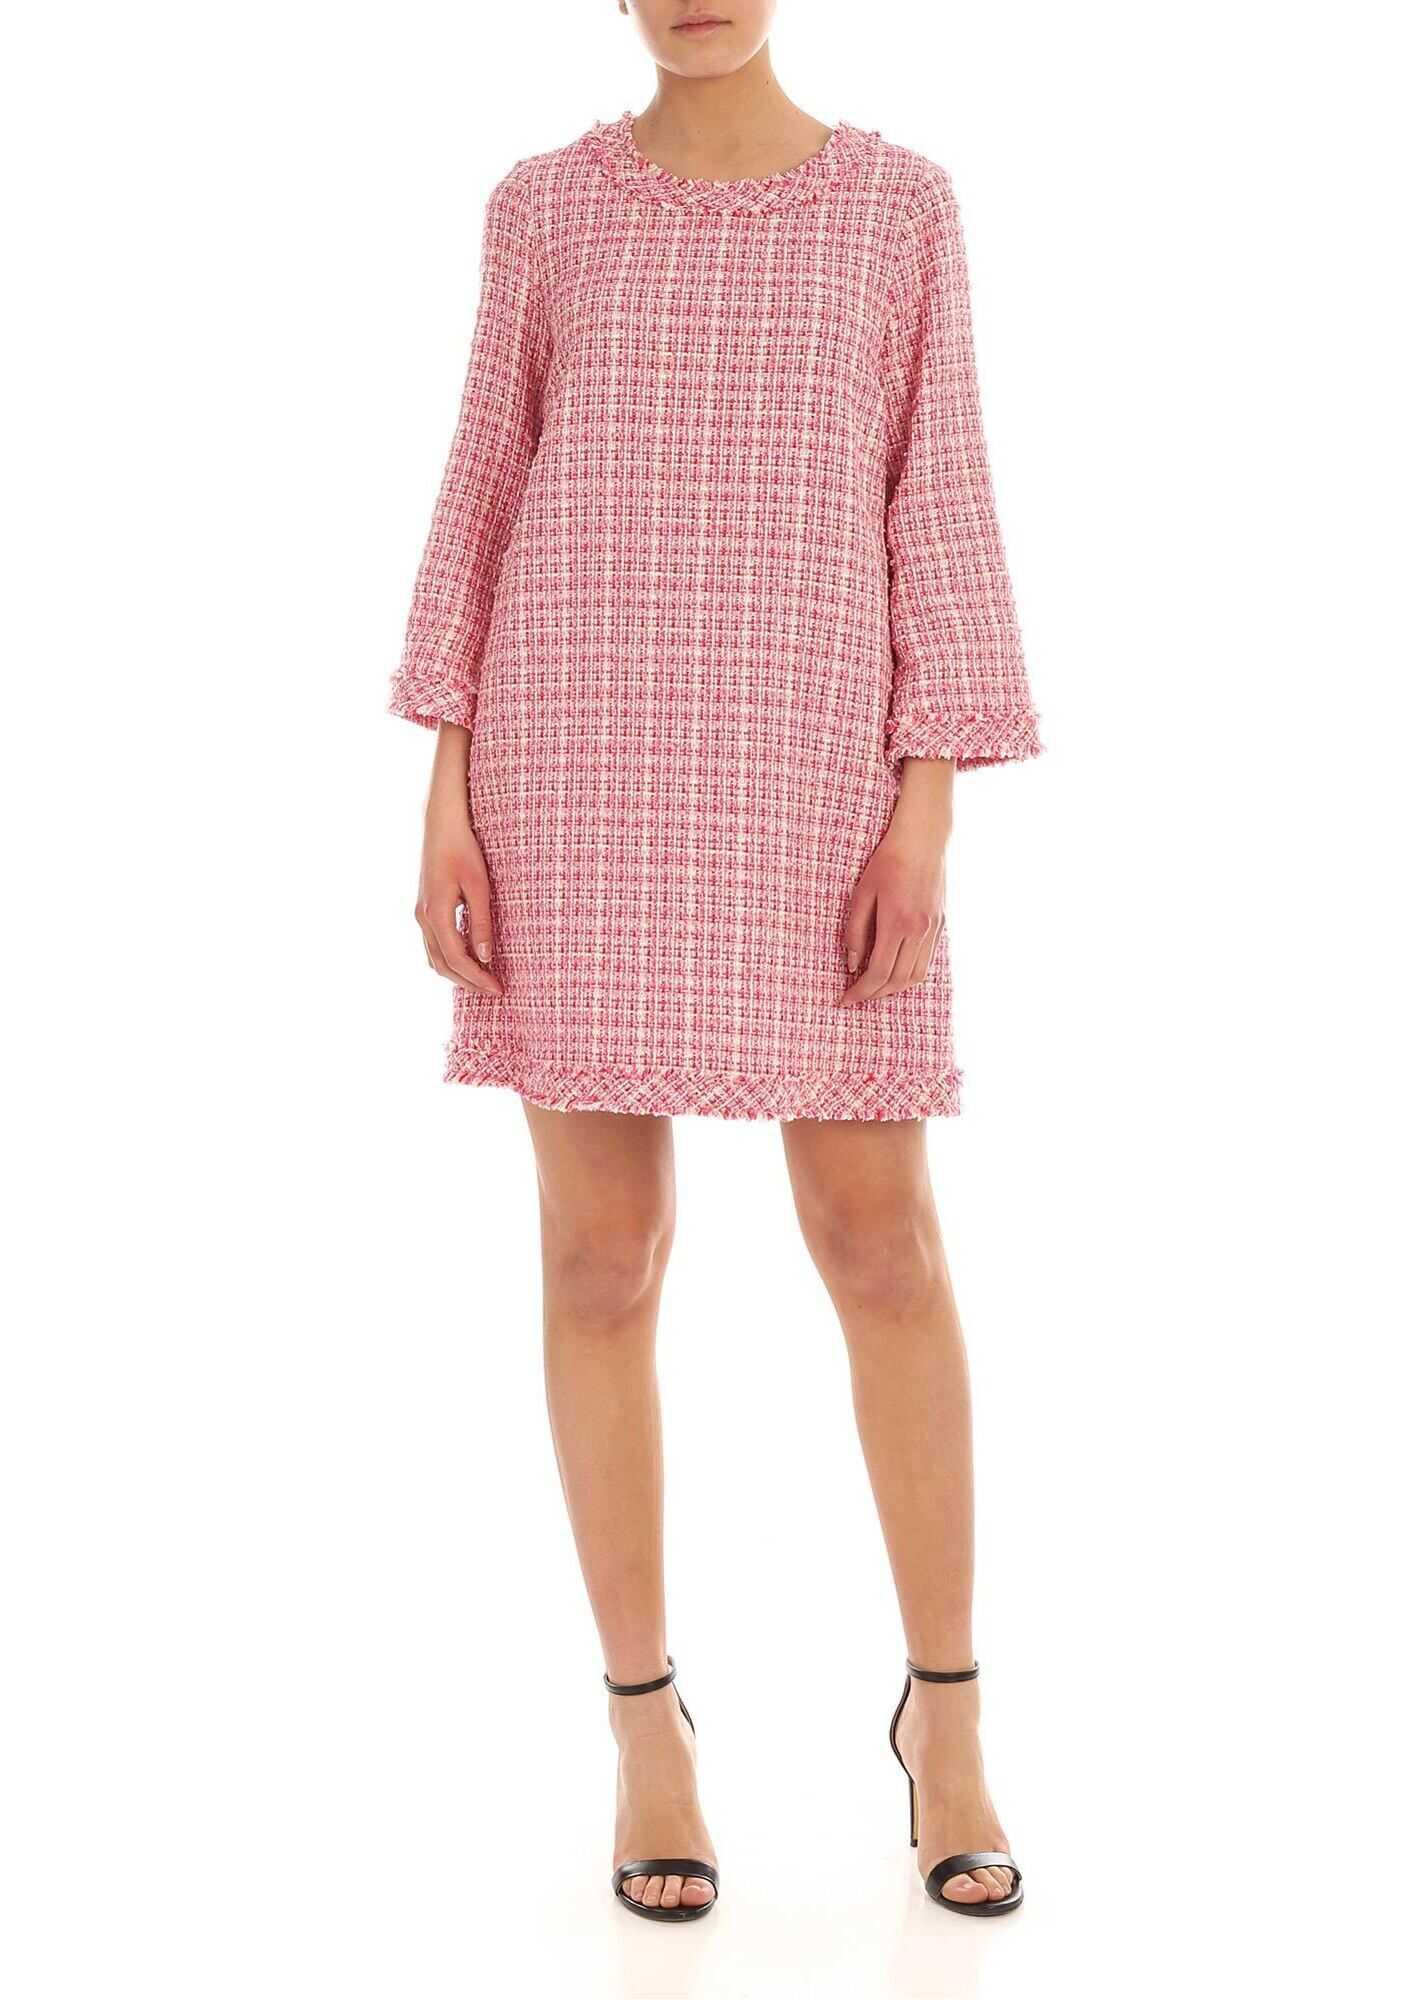 Be Blumarine Bouclè Dress In White And Pink Pink